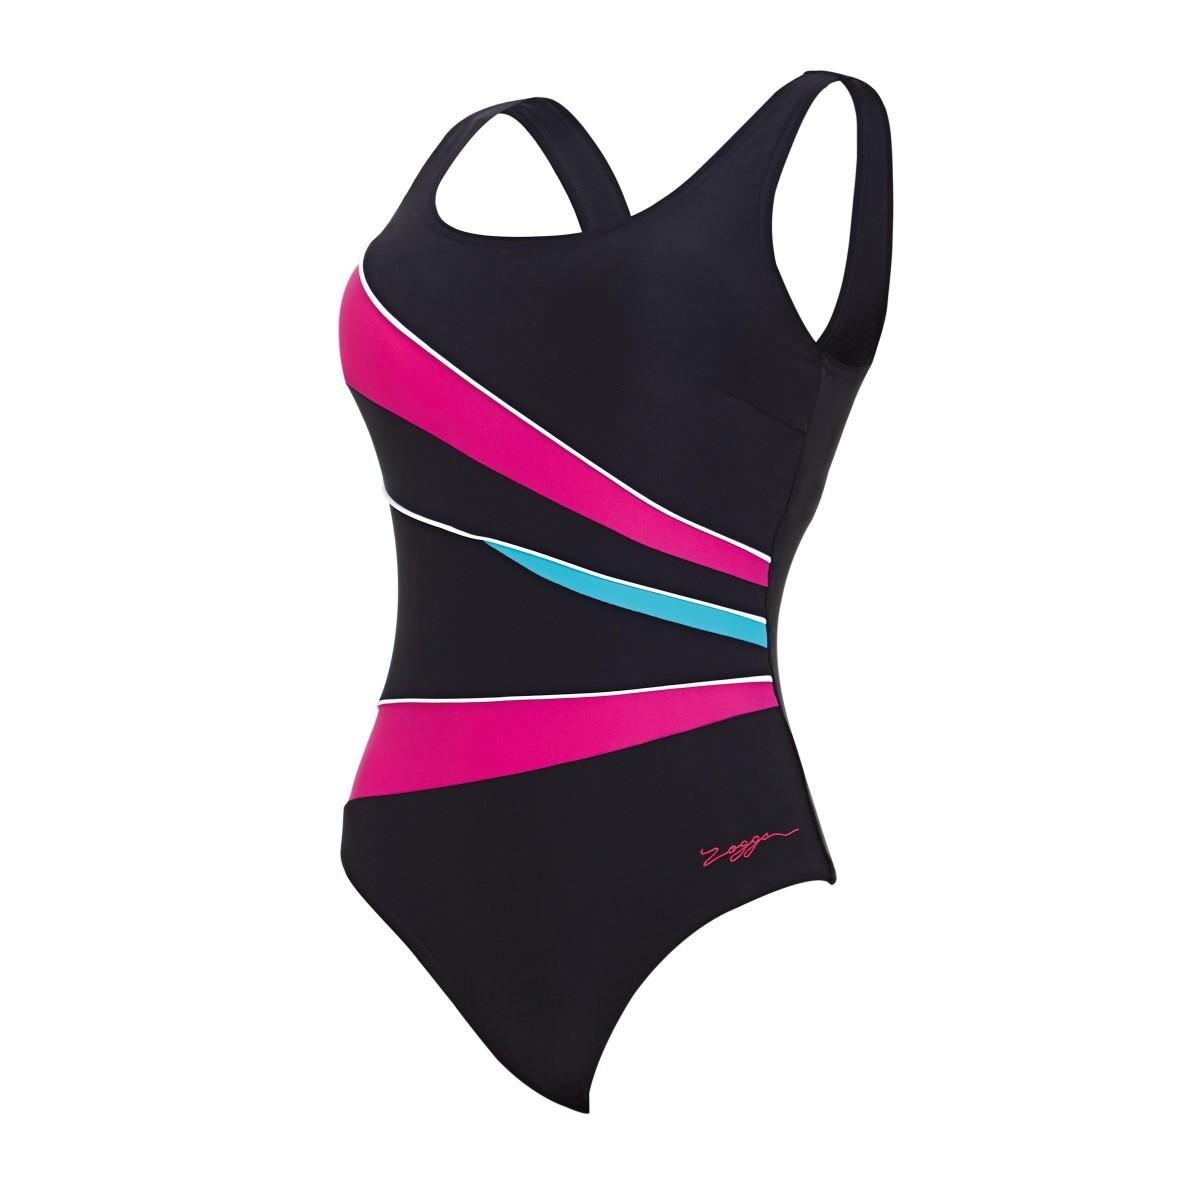 8cb2c147017a1d Zoggs kostium kąpielowy Casuarina Scoopback r. 34 7701135945 ...